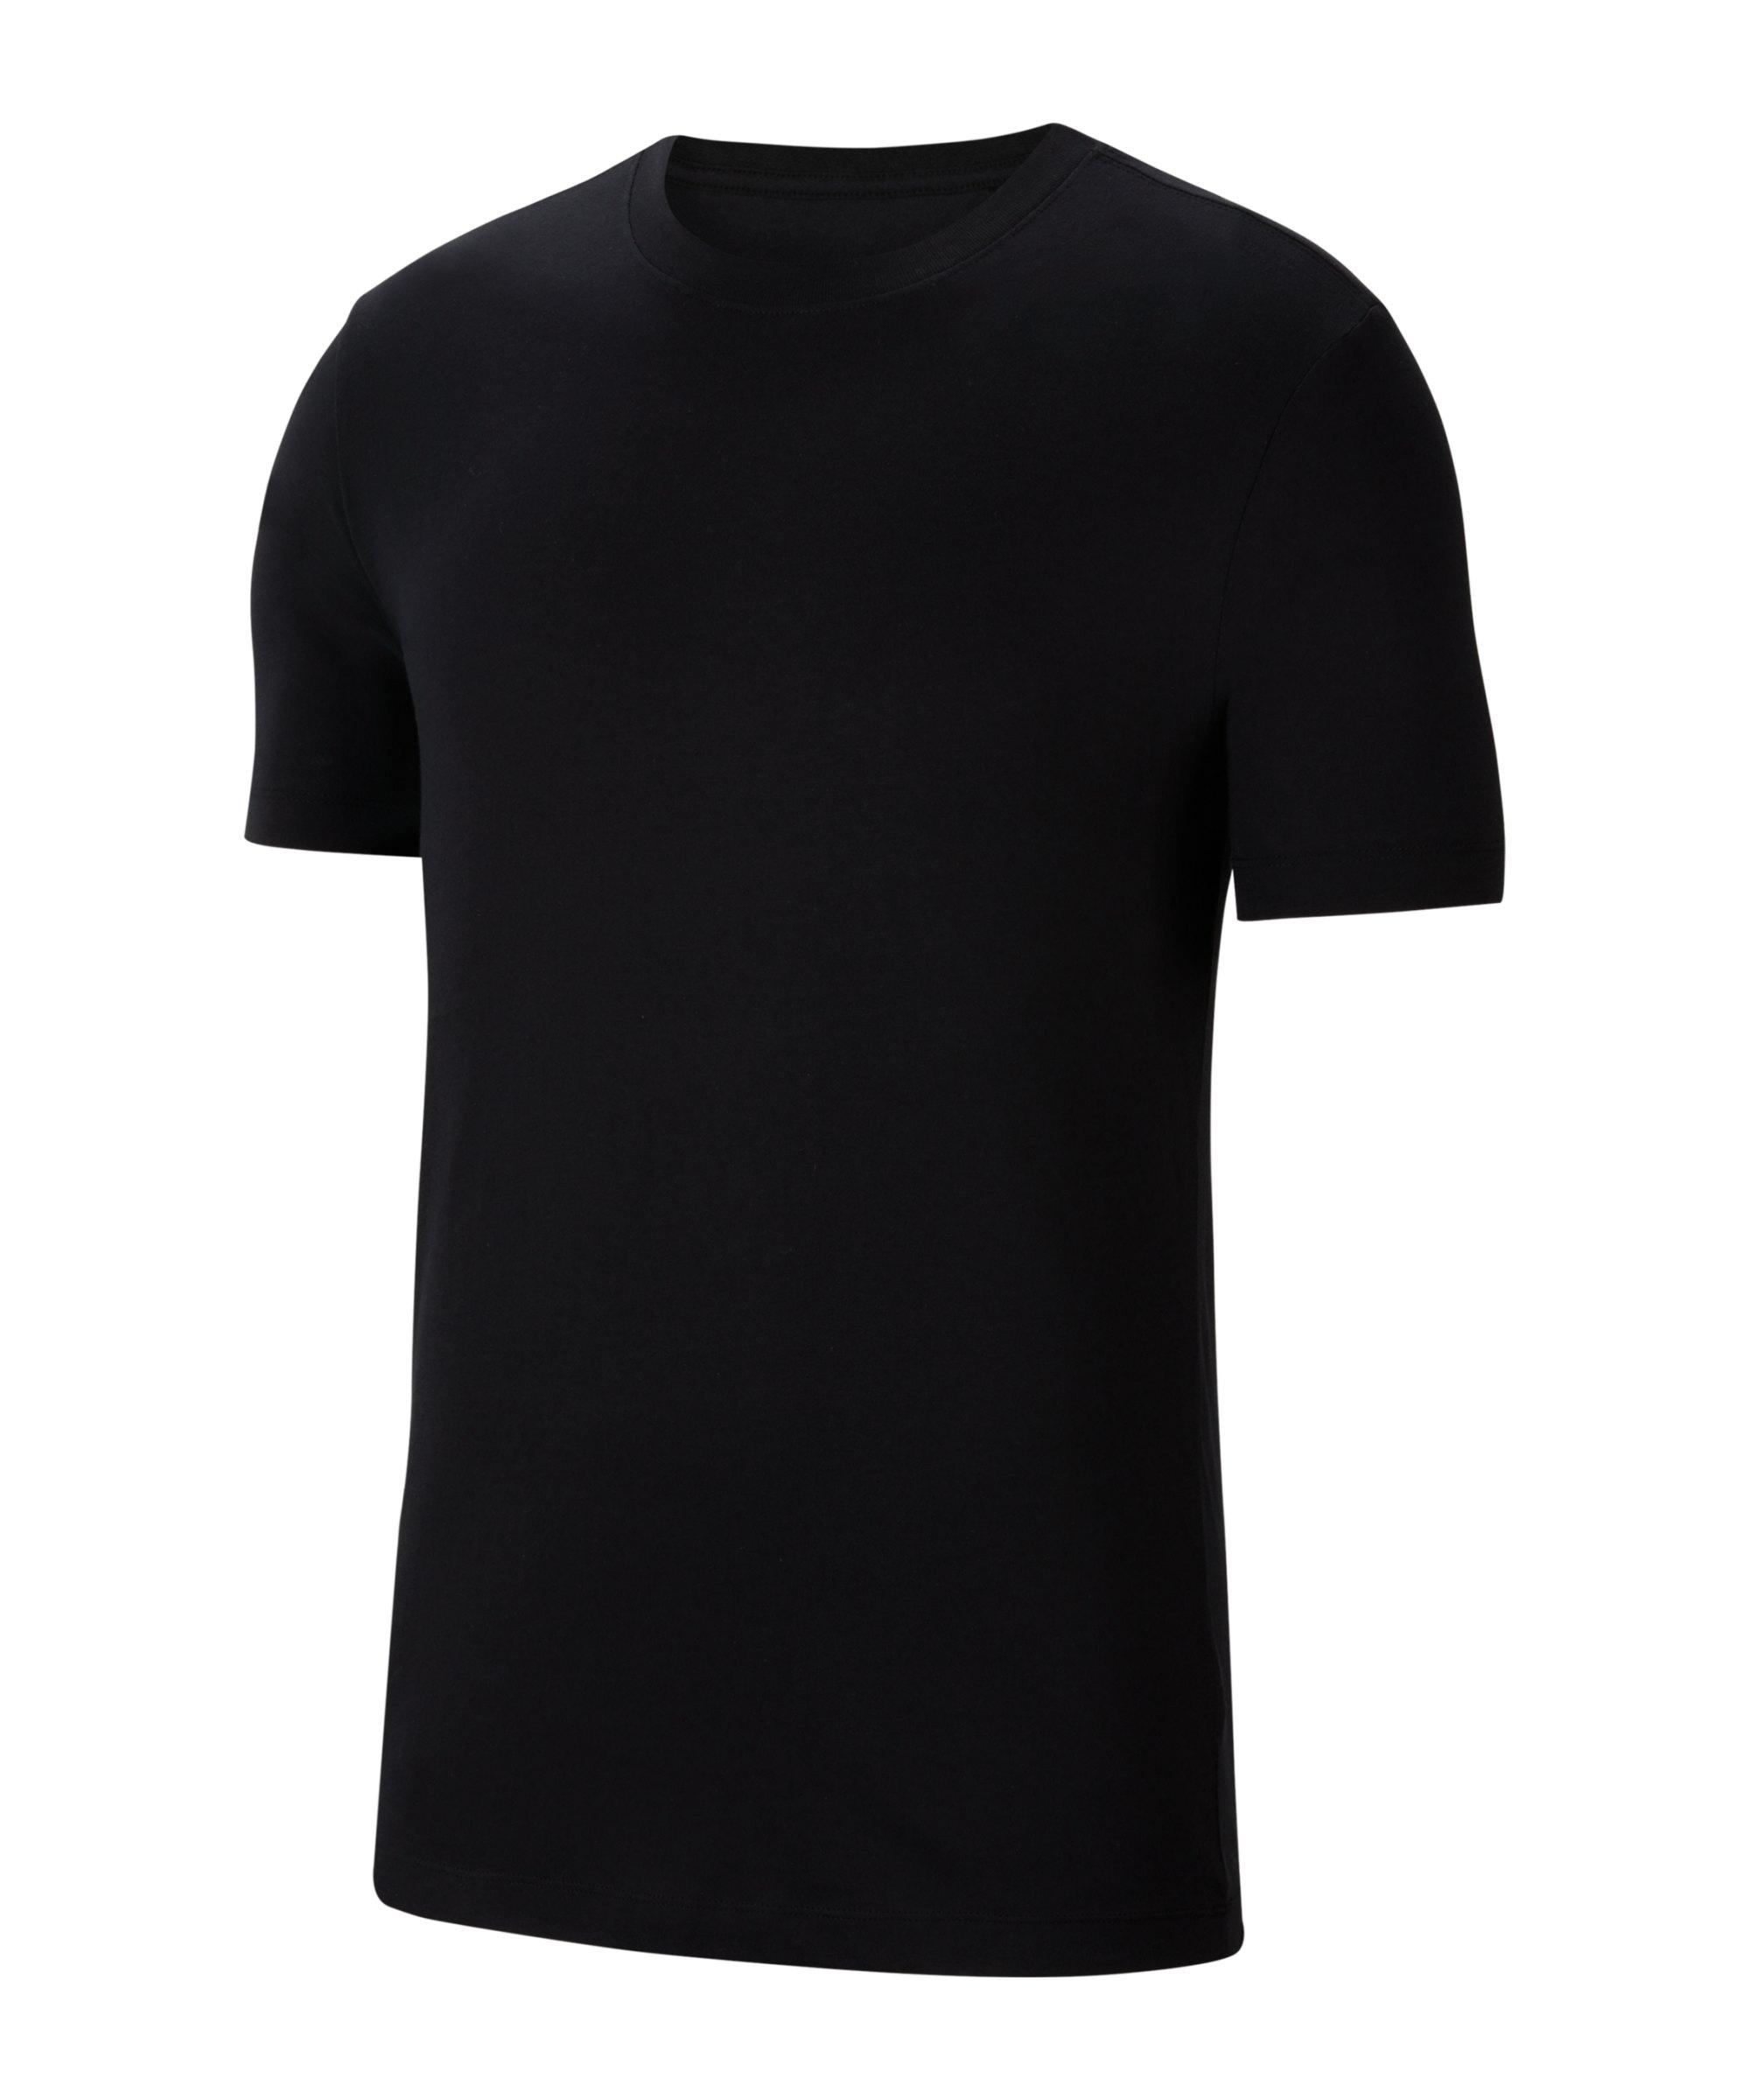 Nike Park 20 T-Shirt Kids Schwarz Weiss F010 - schwarz